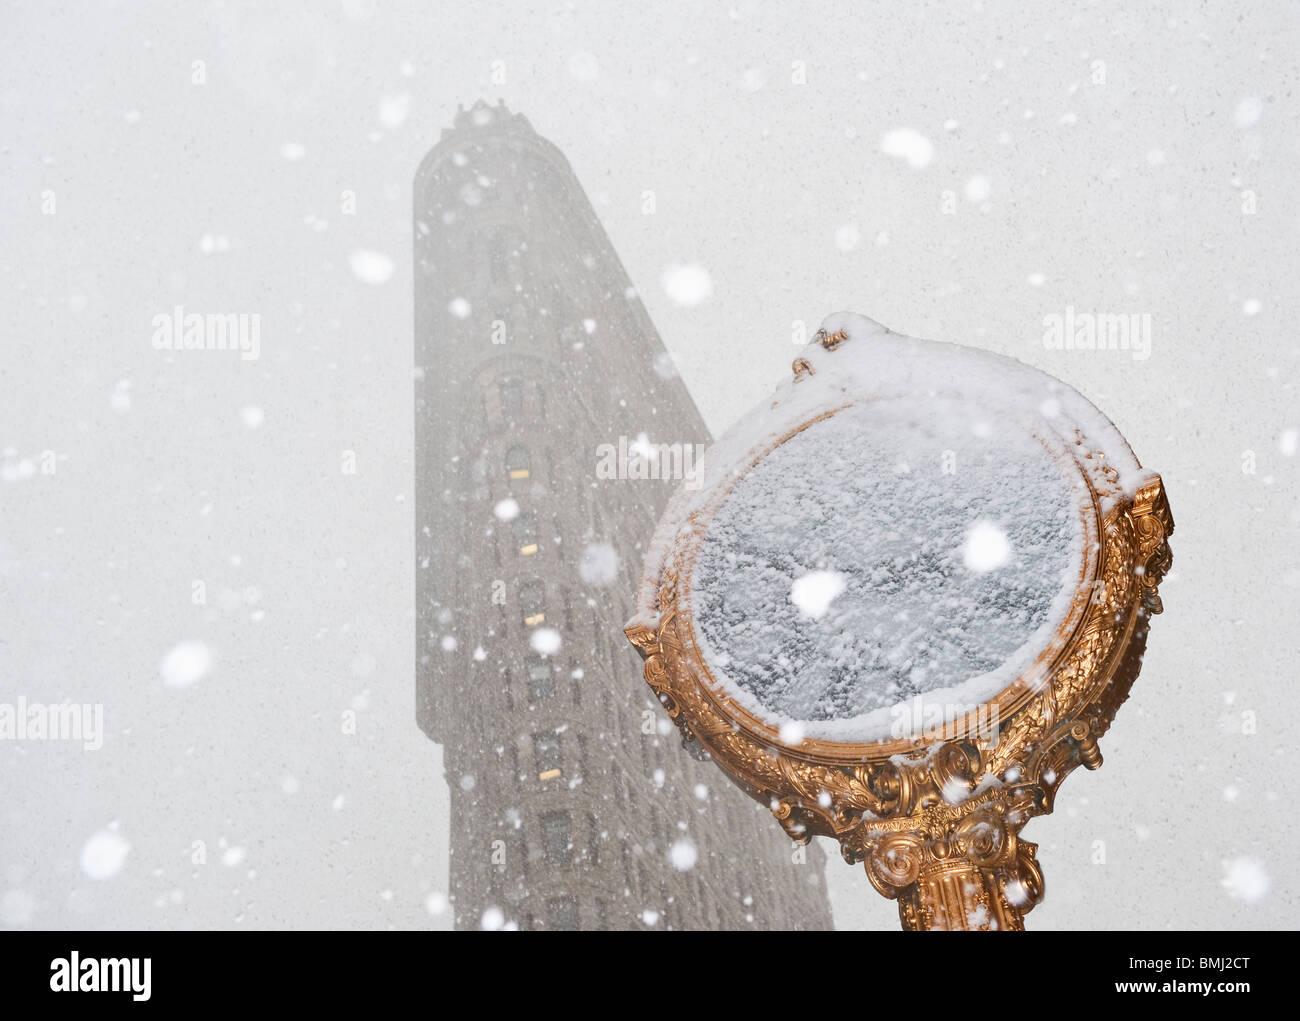 Jour de neige en milieu urbain Photo Stock